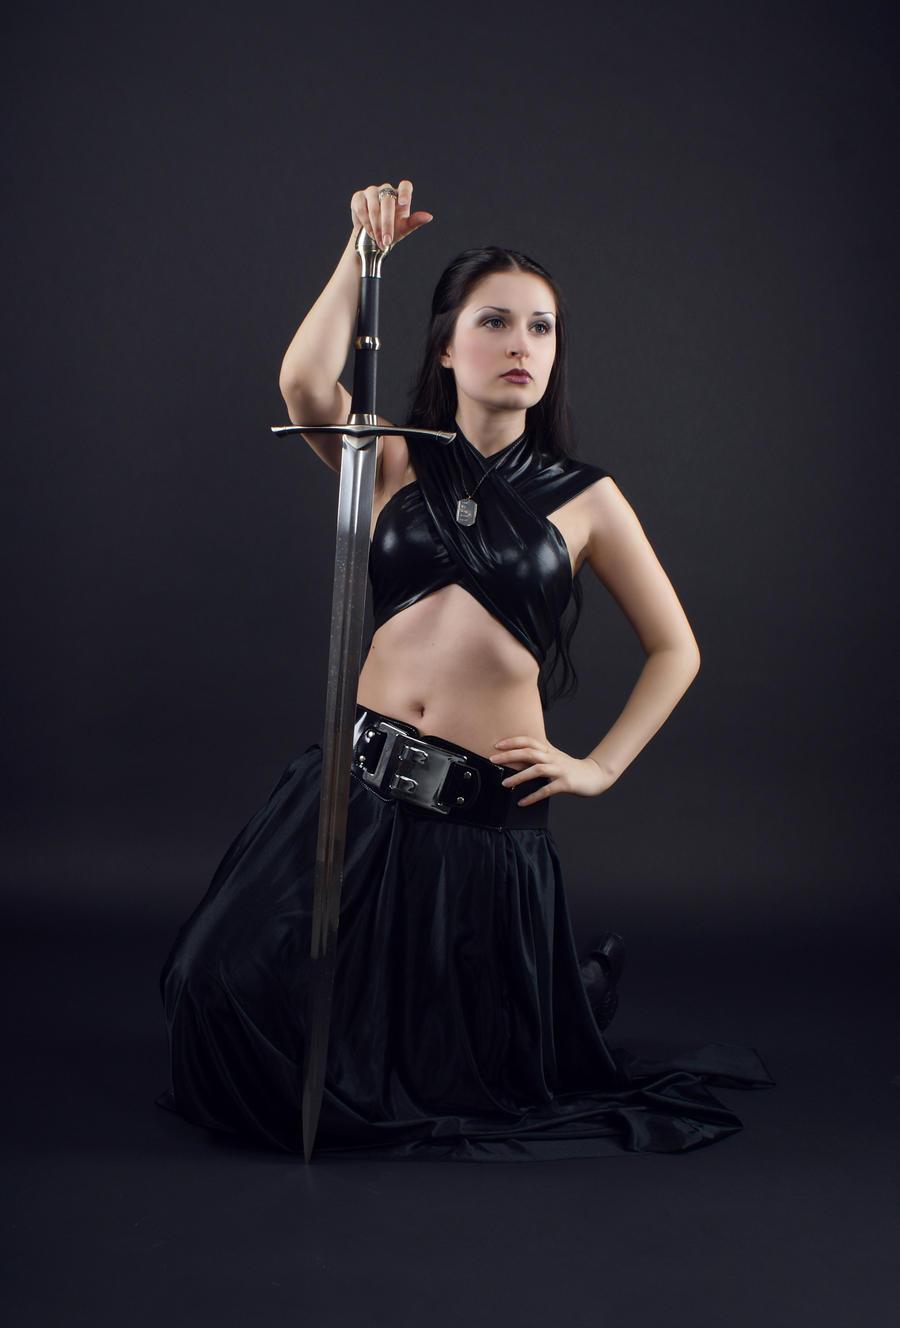 Anett Frozen the Warrior by anettfrozen